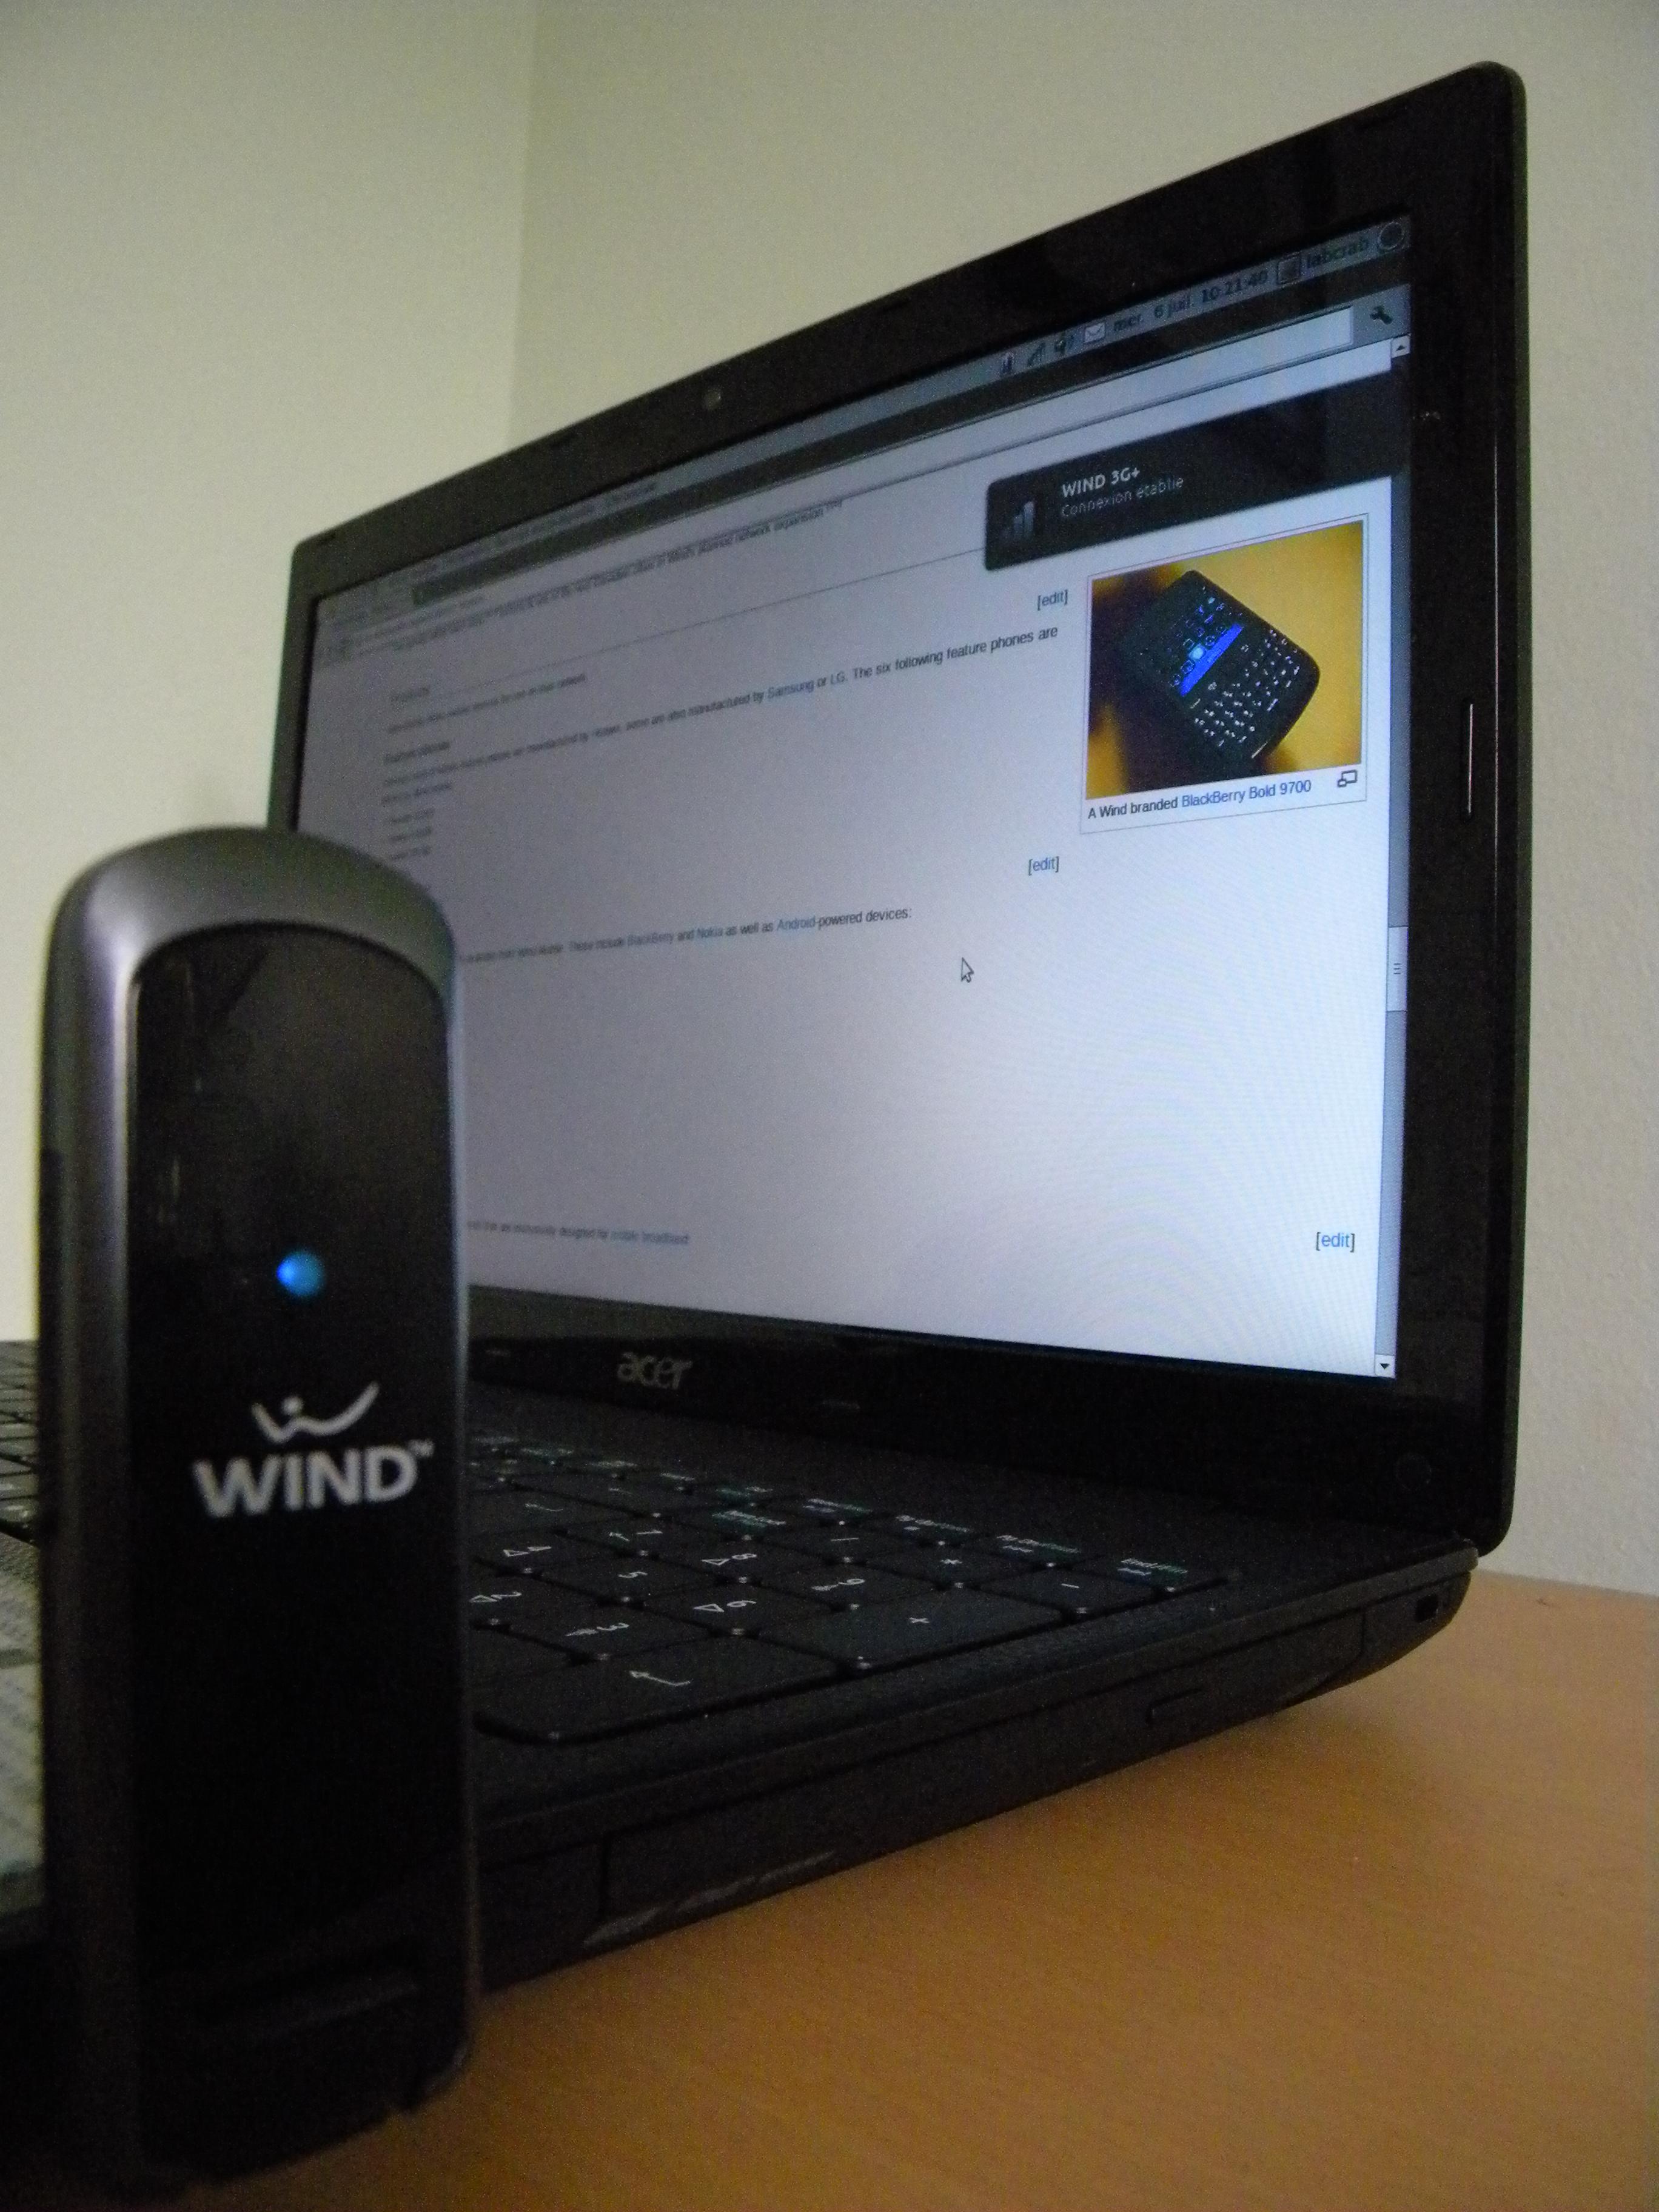 Mobile broadband modem - Wikipedia